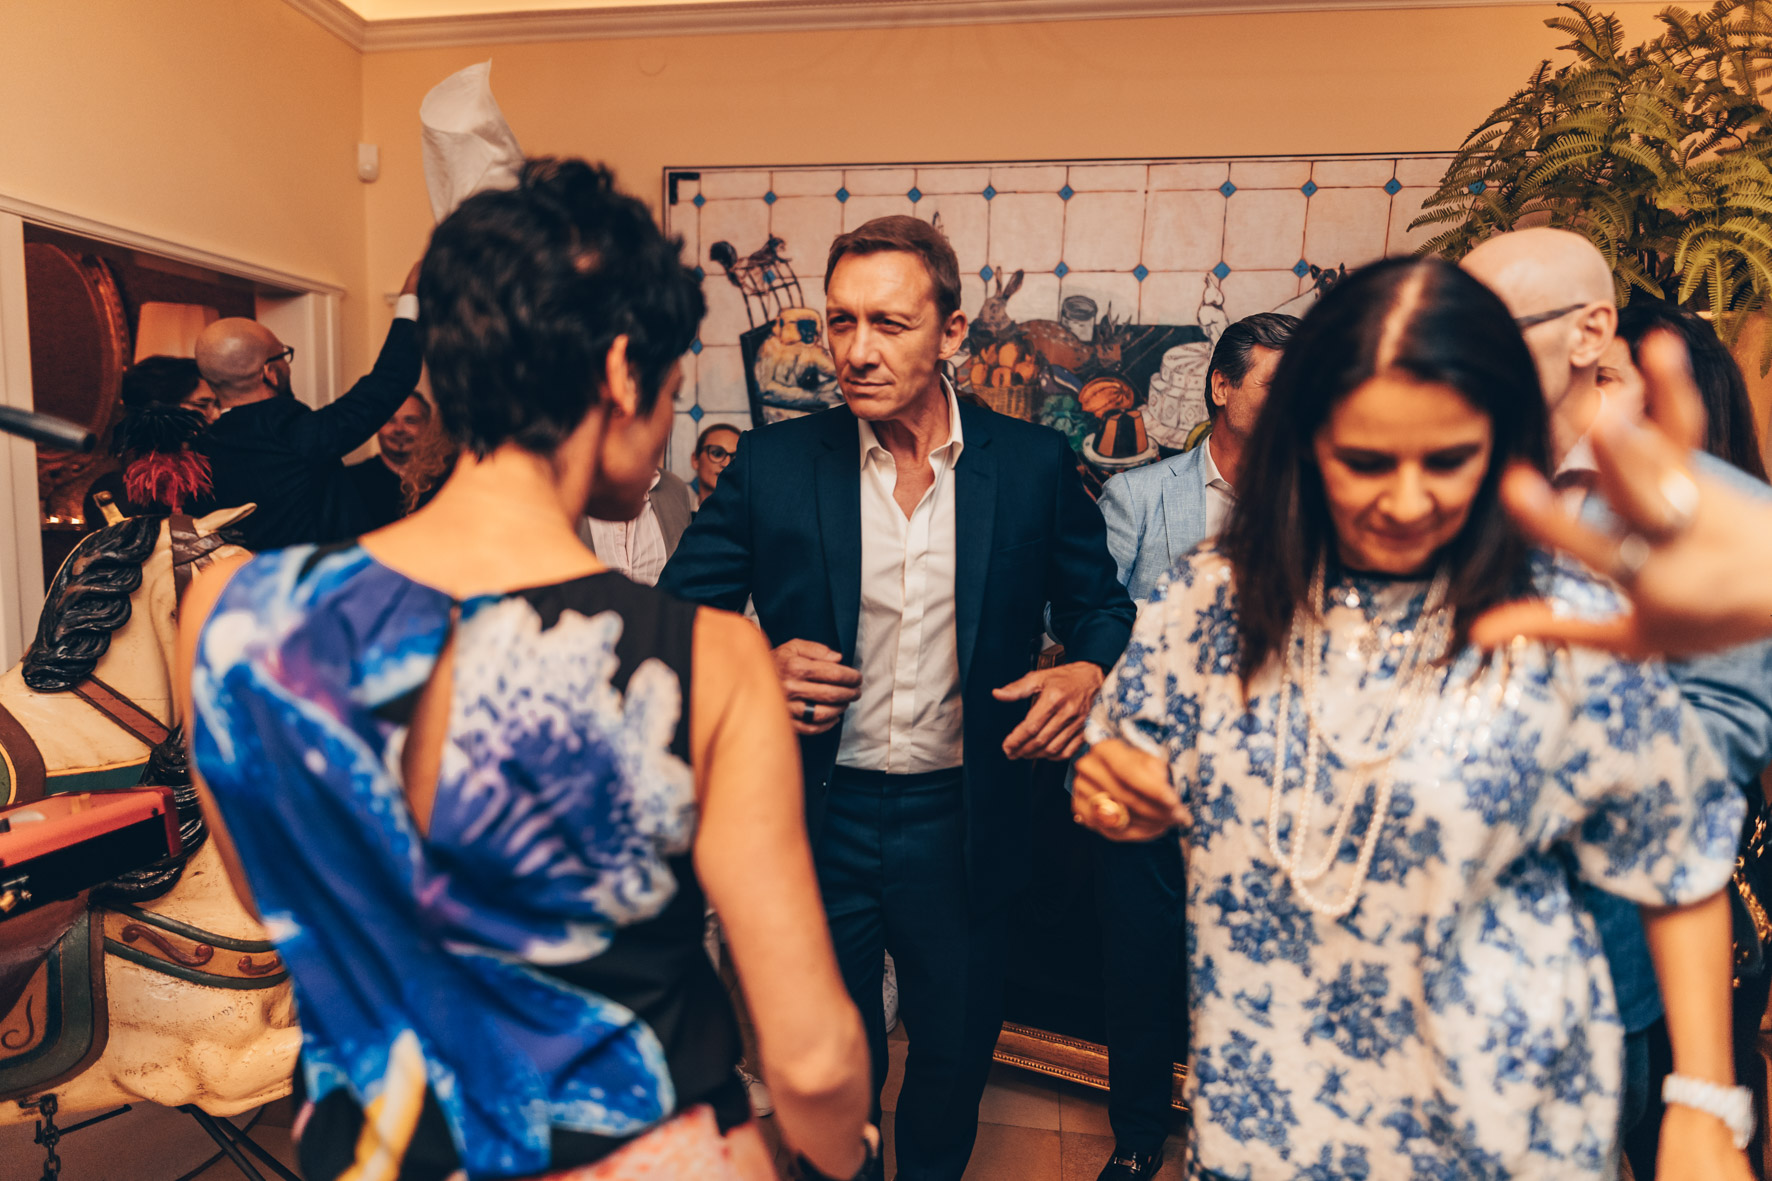 Konrad-lifestyle-art-basel-%22prestige%22-2019-268.jpg